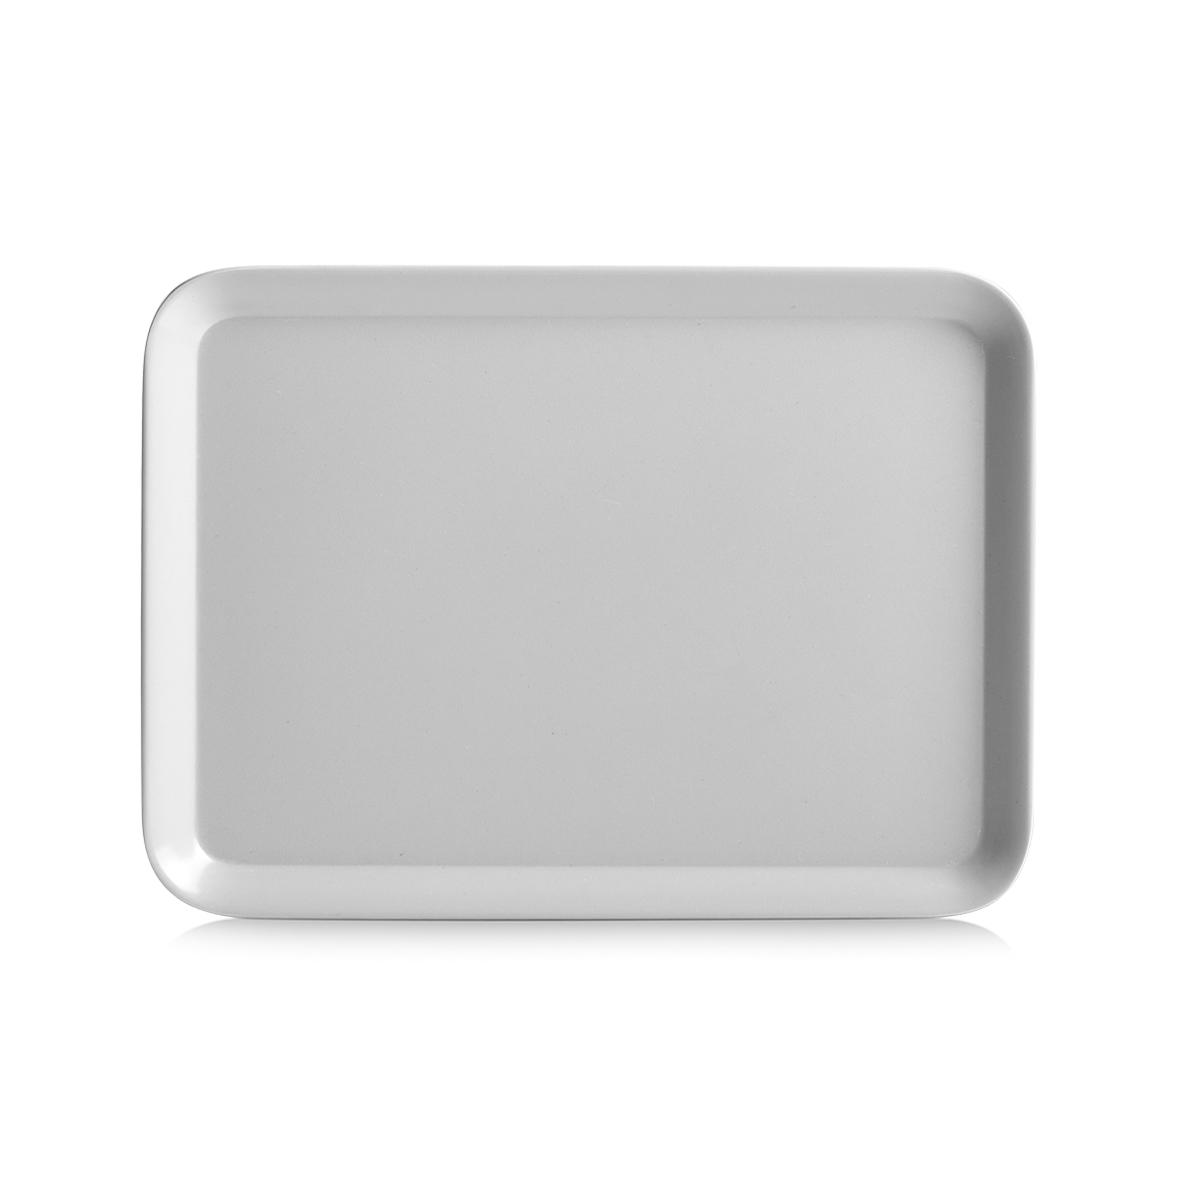 Tava pentru servire Aqua II, Melamina, l24xA18 cm-Gri imagine